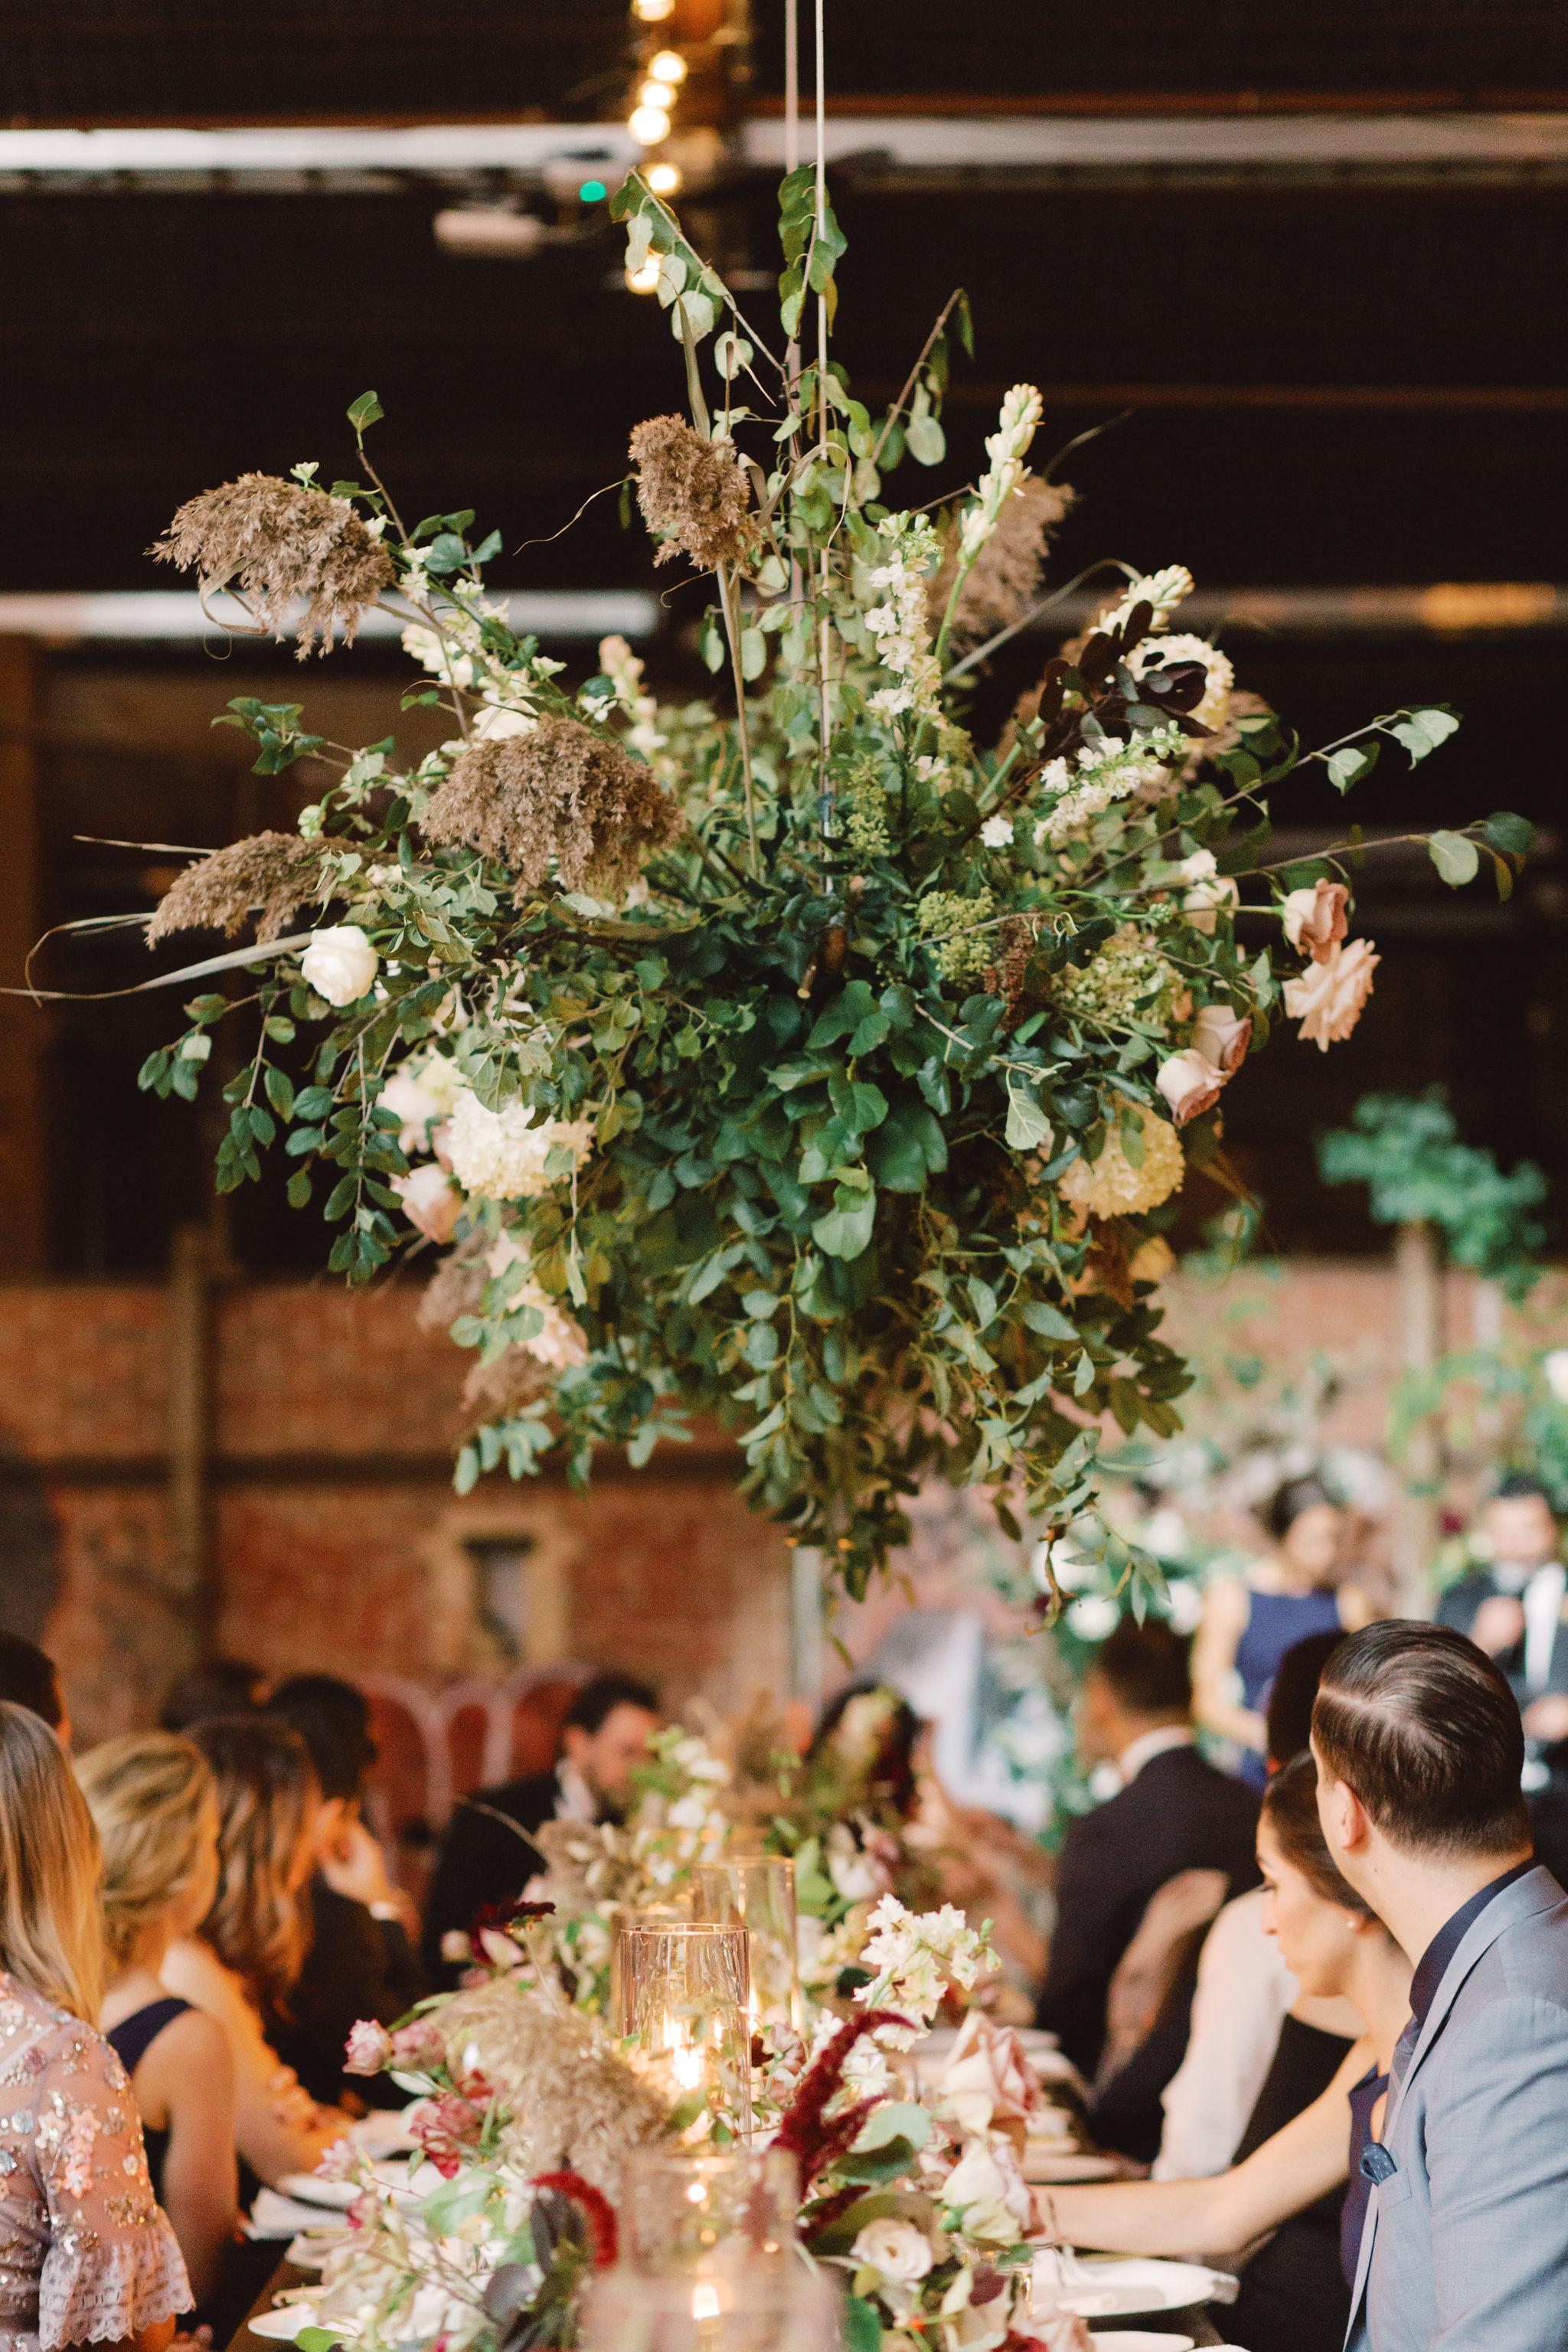 1458-artiese-evergreen-brickworks-wedding-ashleycraig-9335.jpg